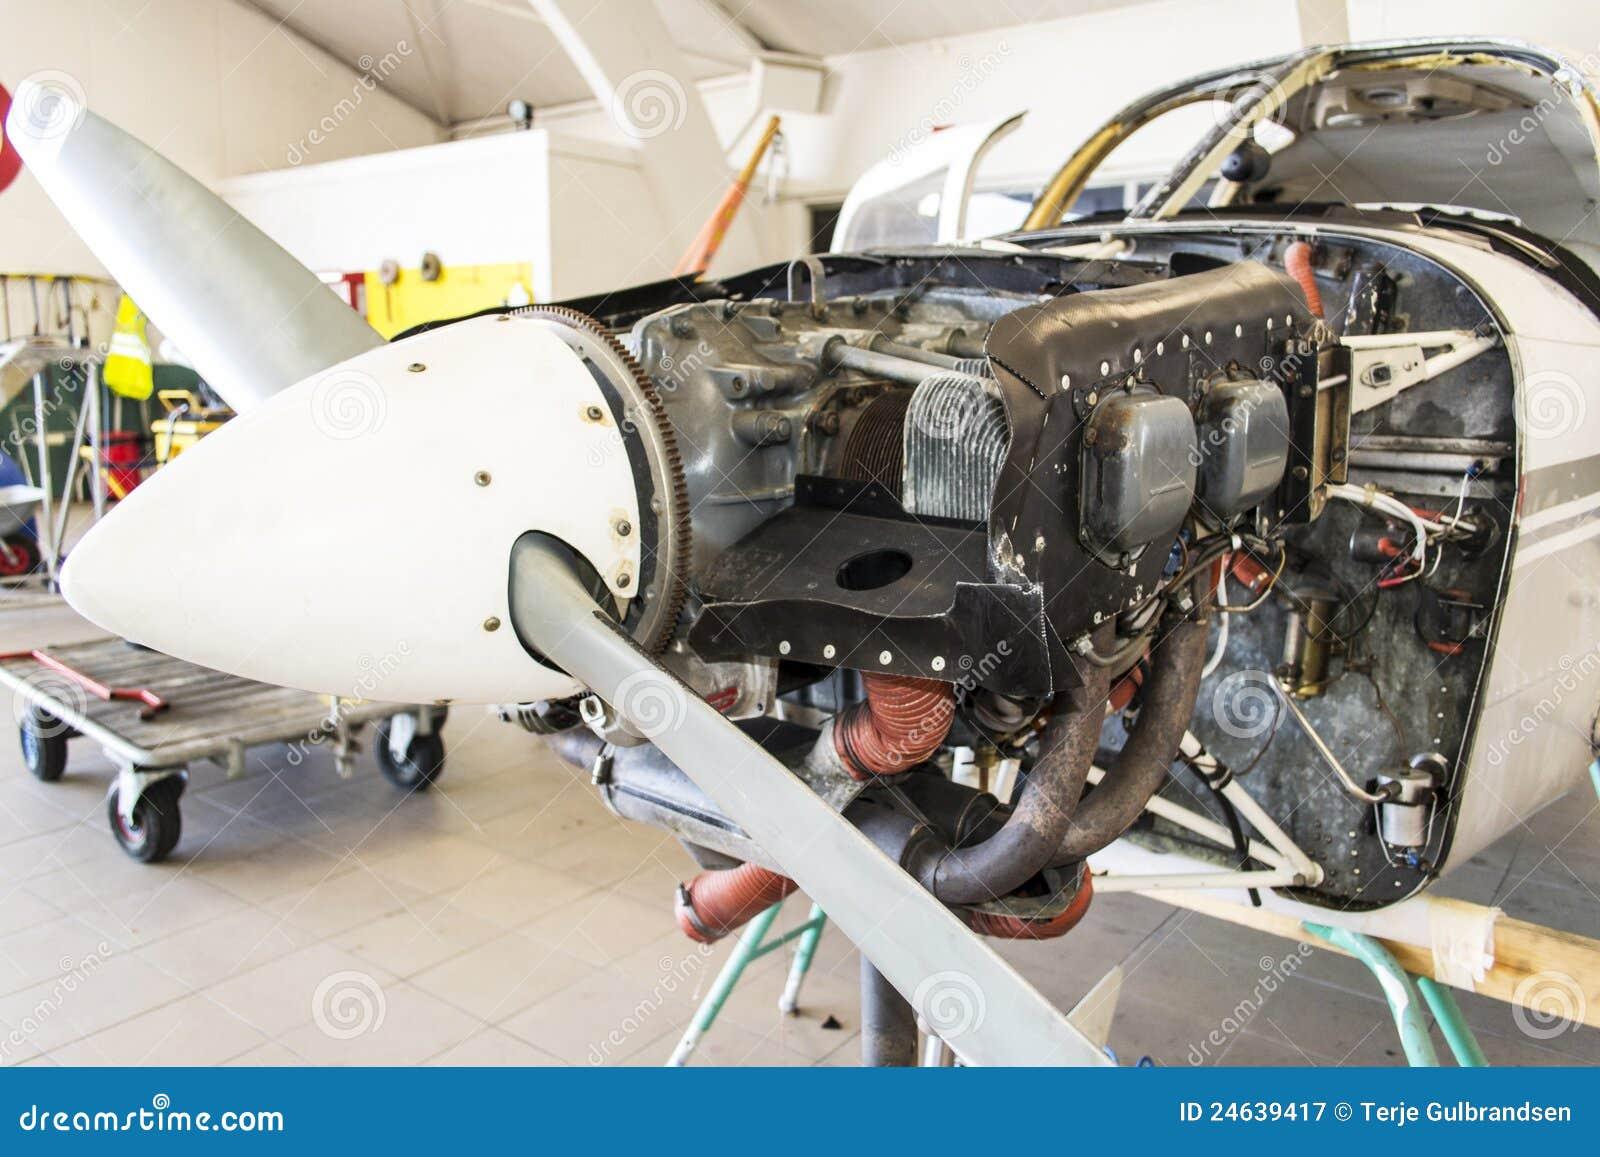 Cessna 152 Engine Royalty Free Stock Photography - Image ...